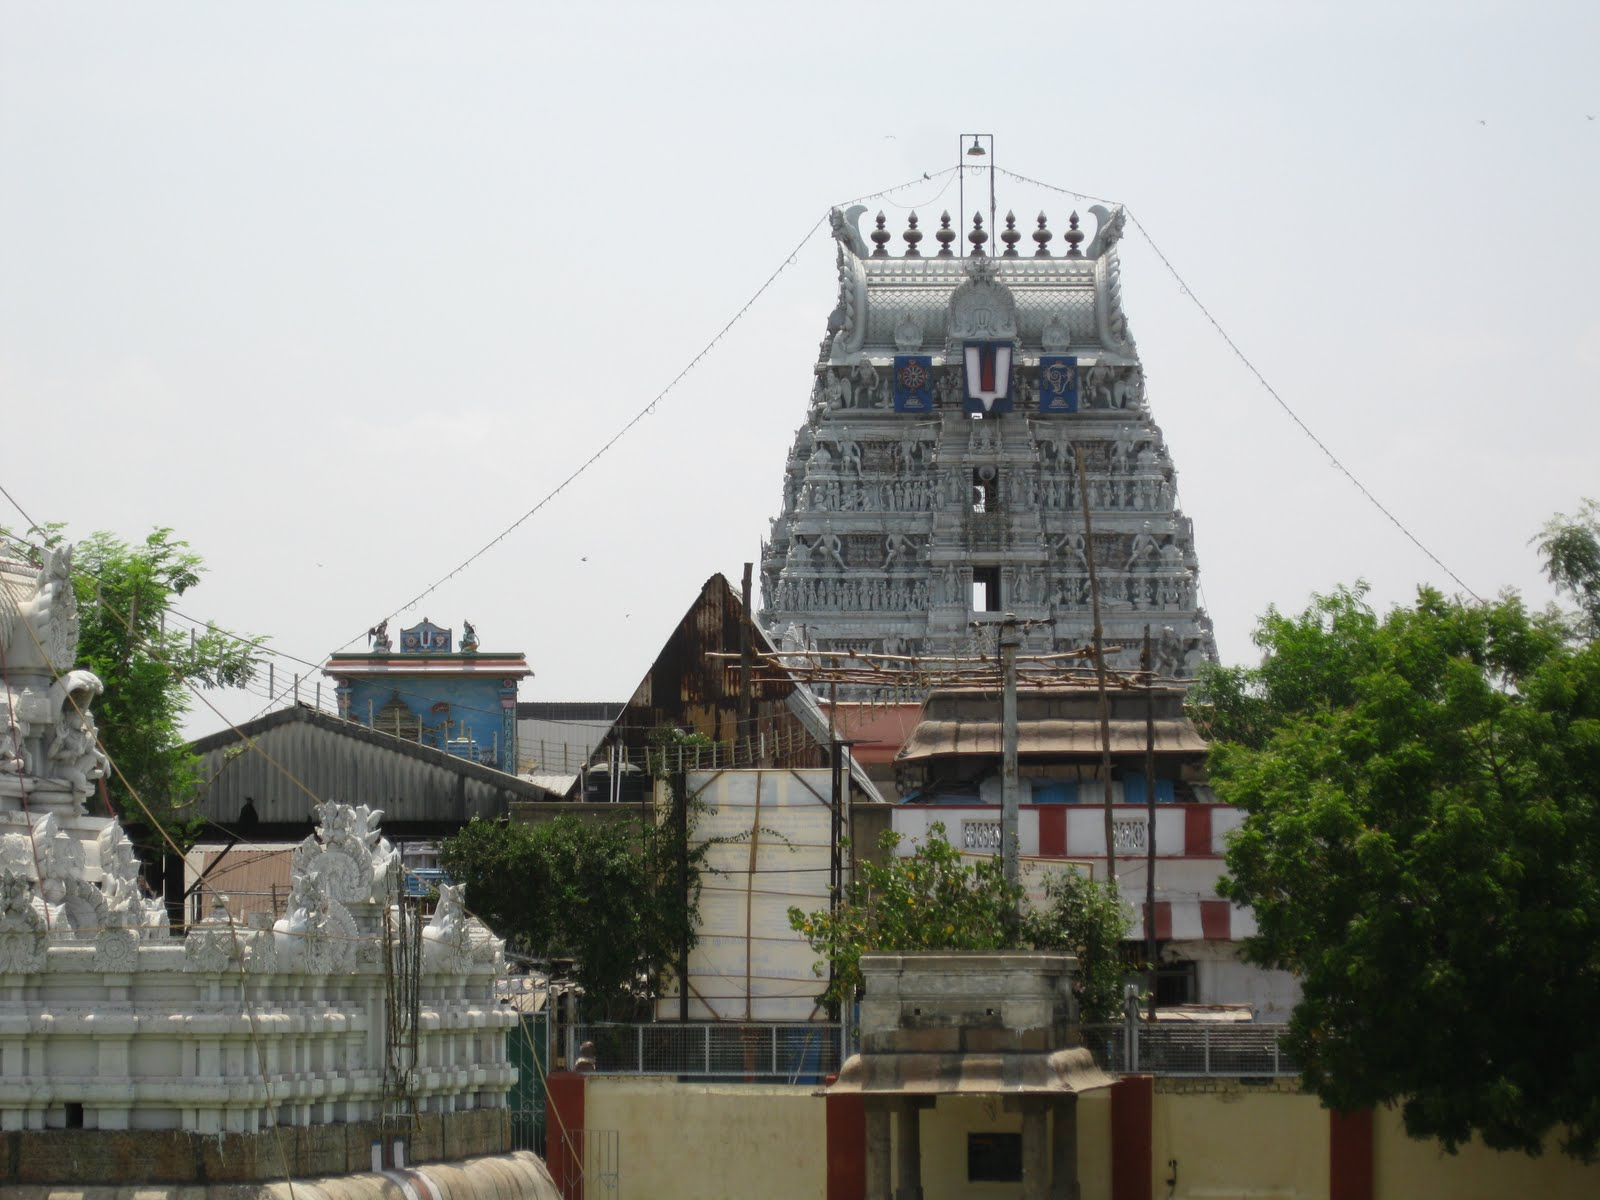 Sri Parthasarathy Swamy Temple (Thiruvallikeni - Triplicane) Chennai - Divya Desam 41